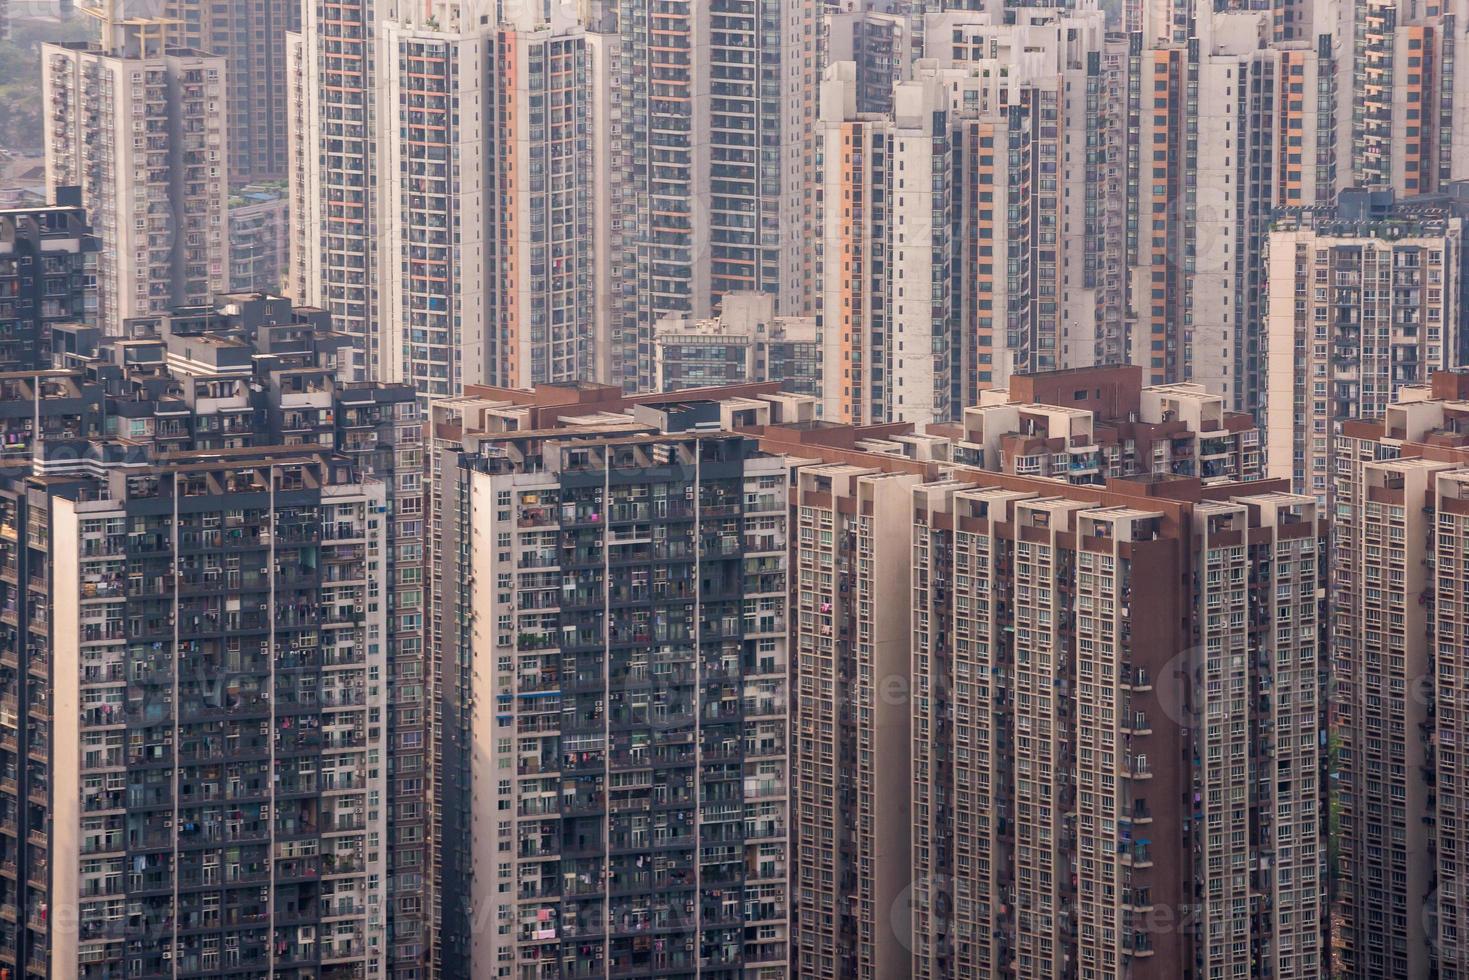 Chongqing, Cina - febbraio11, 2013: Chongqing, Cina skyline del centro città. foto